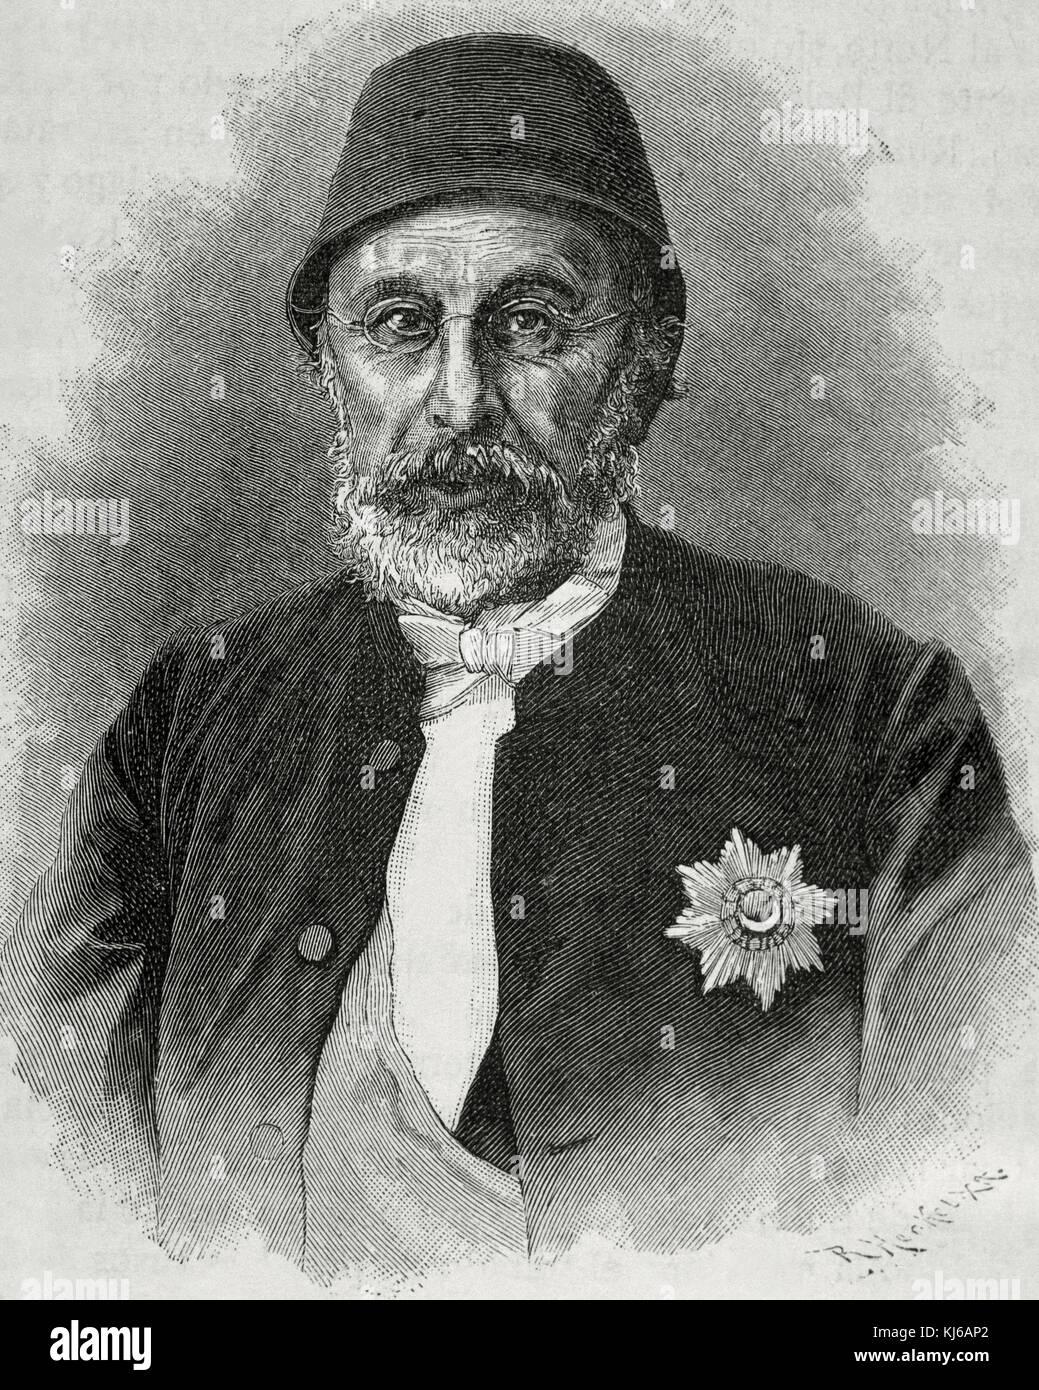 Mehmed Fuad Pasha (1814-1869). Ottoman statesman. Grand Vizier of the Ottoman Empire in 1861. Portrait. Engraving - Stock Image